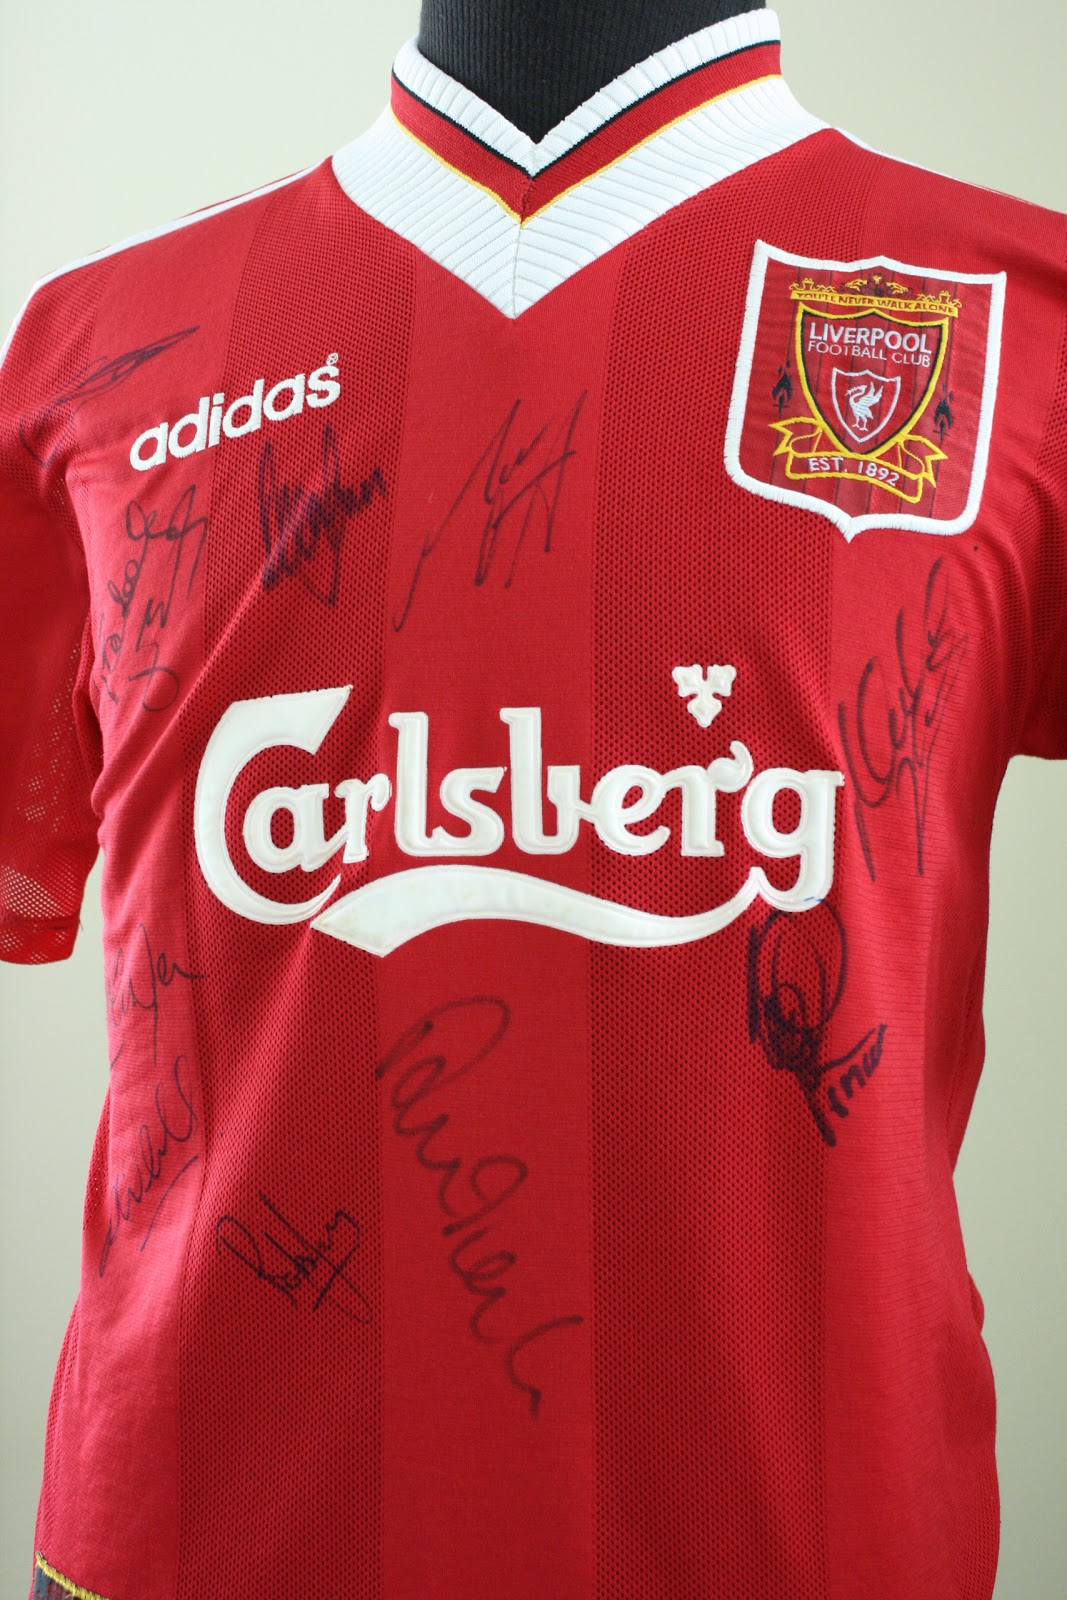 fa454ee0941 fesretrobrunei  thesportshop  1995-97 LFC home kit with players ...